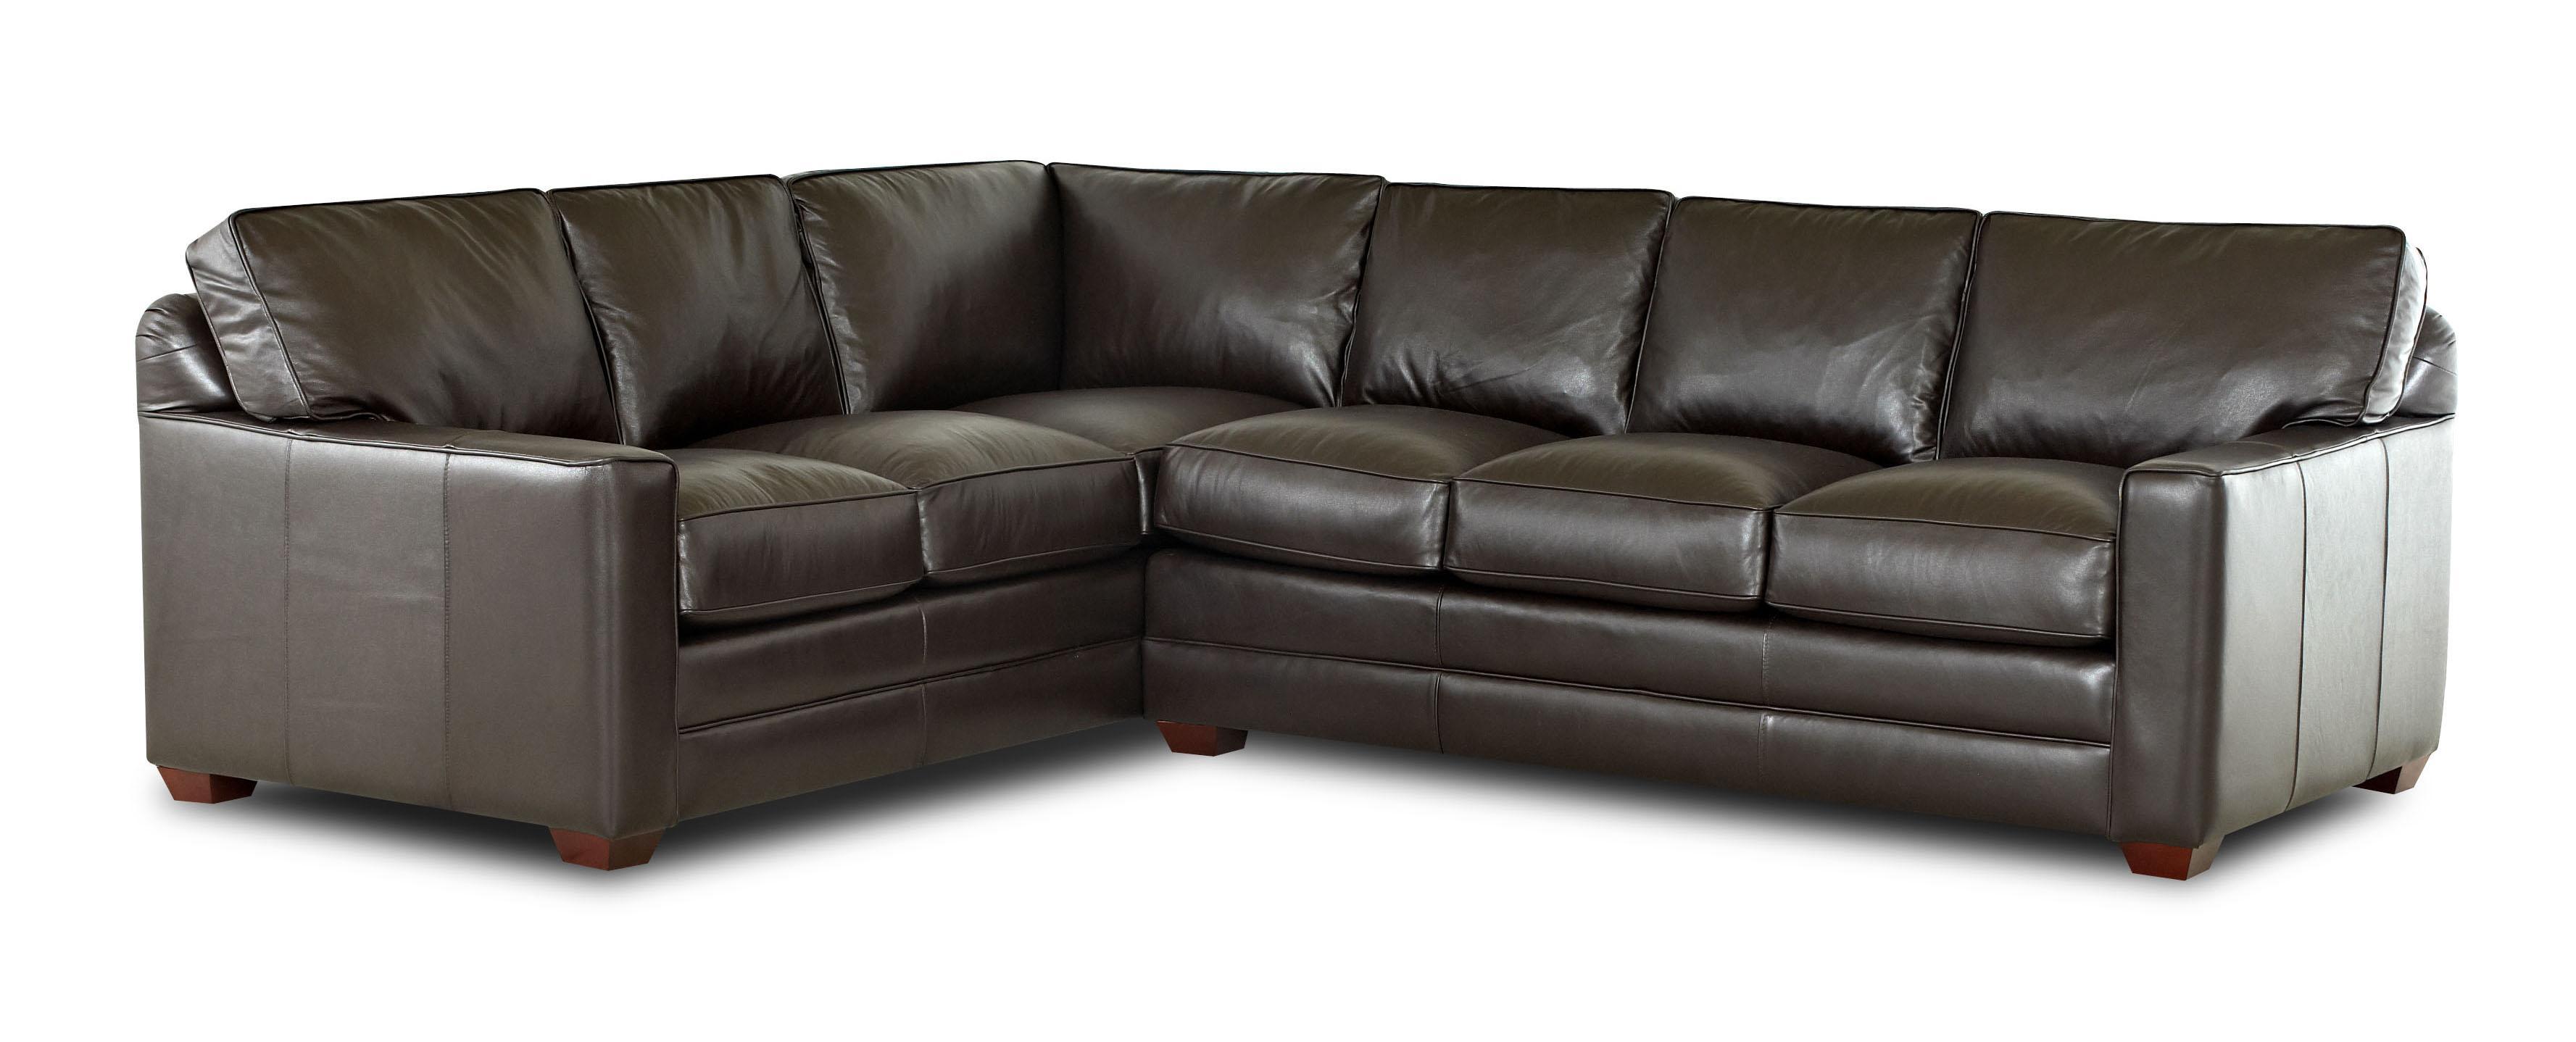 Klaussner Pantego 2 Piece Sectional Sofa With Laf Corner